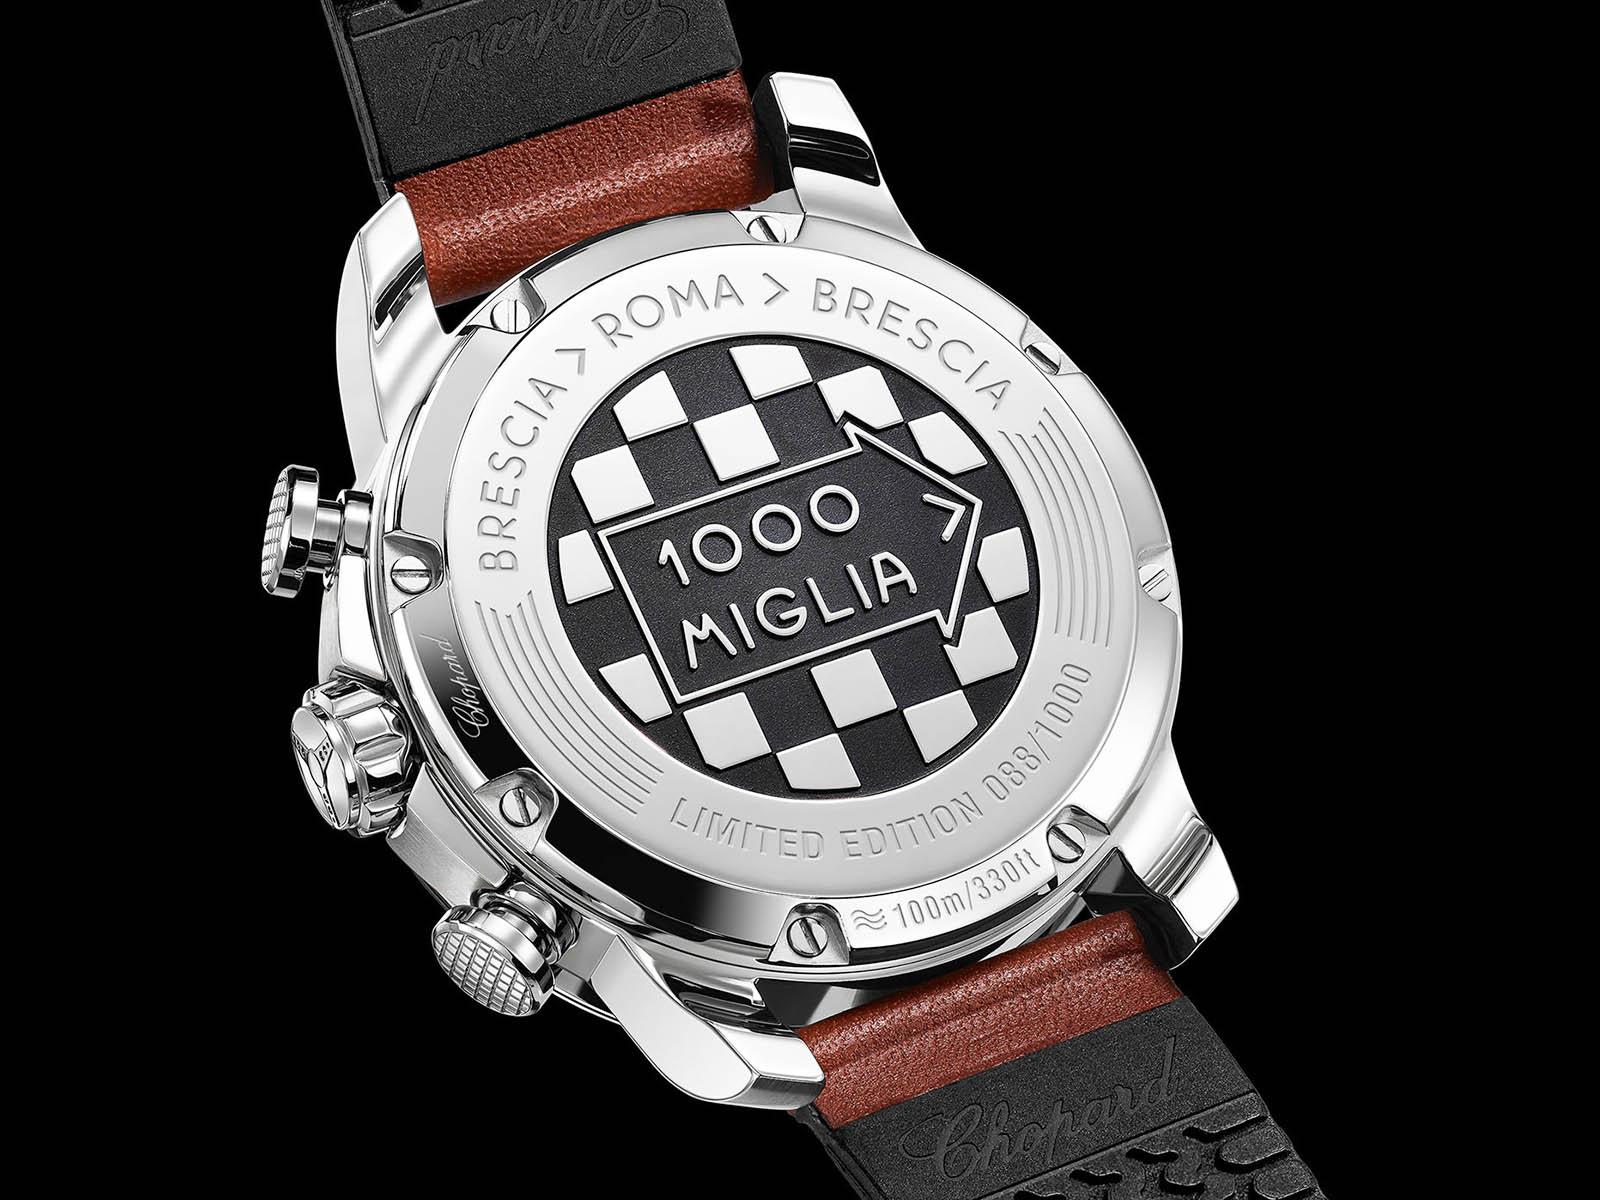 168571-3004-chopard-mille-miglia-2019-race-edition-5.jpg